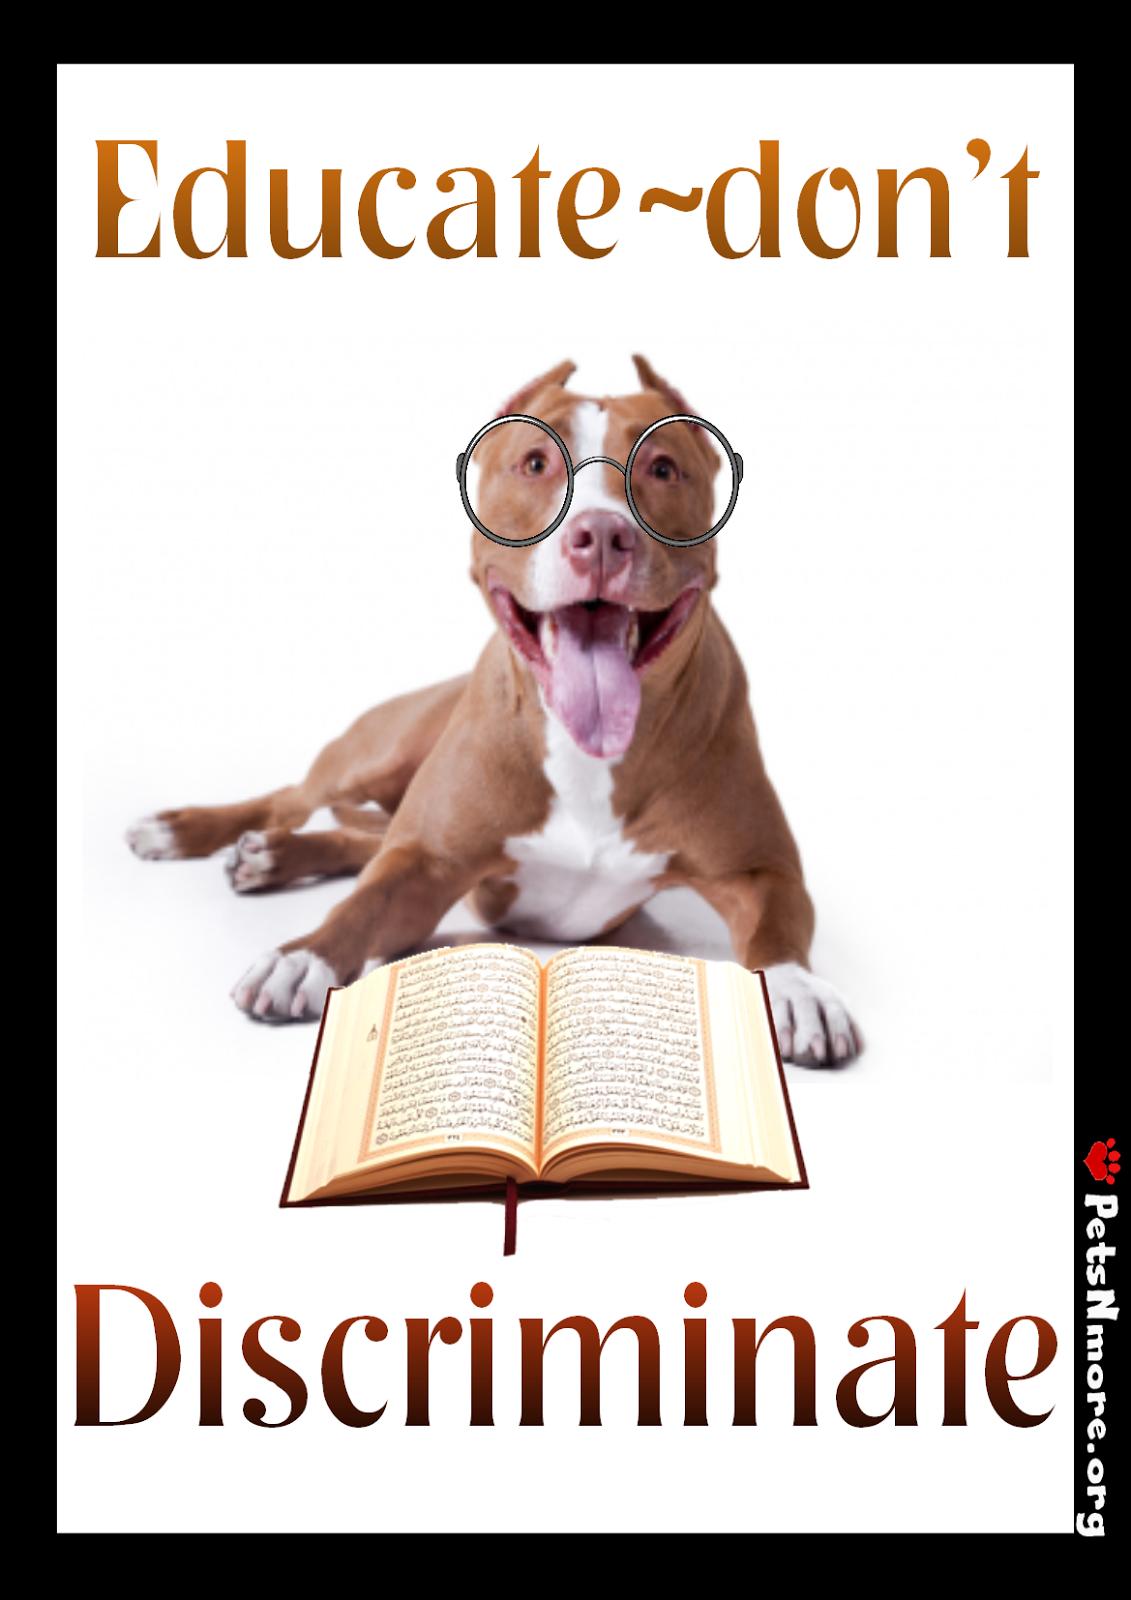 Pitbull Dog Quotes Animal Dog Cat Pet Animal Inspiring Quotes For Animal Lovers